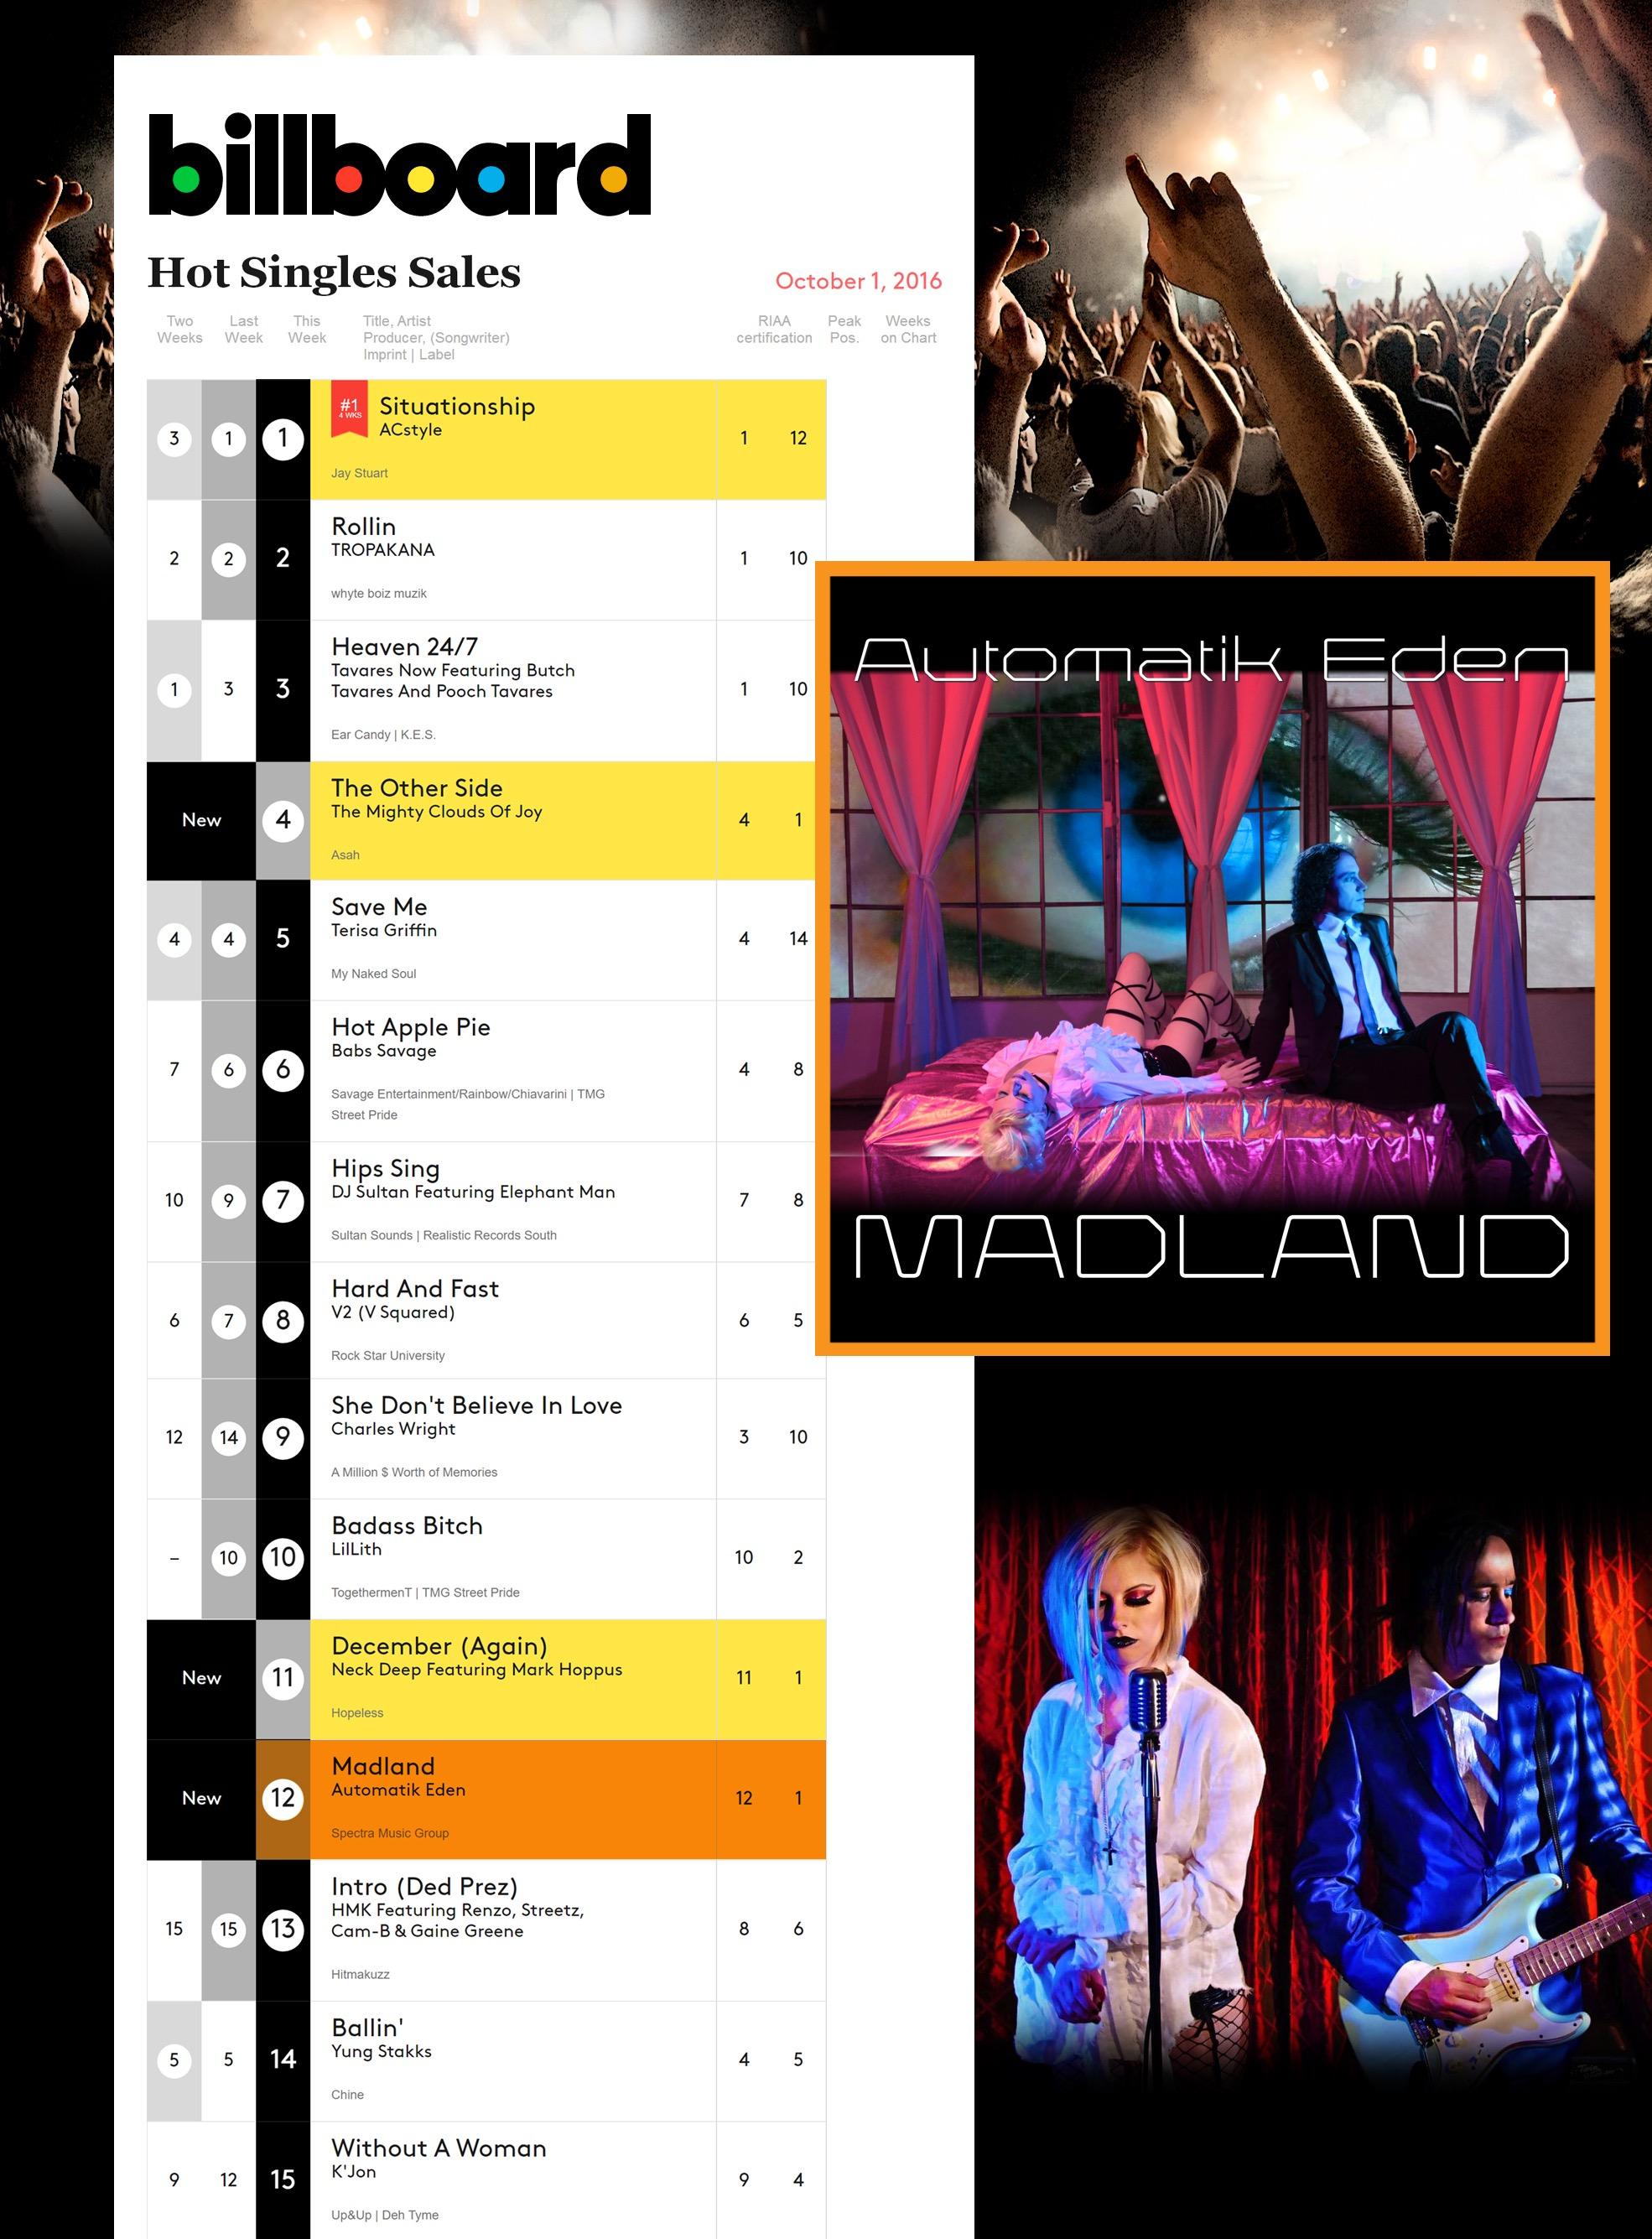 Madland on Billboard Chart